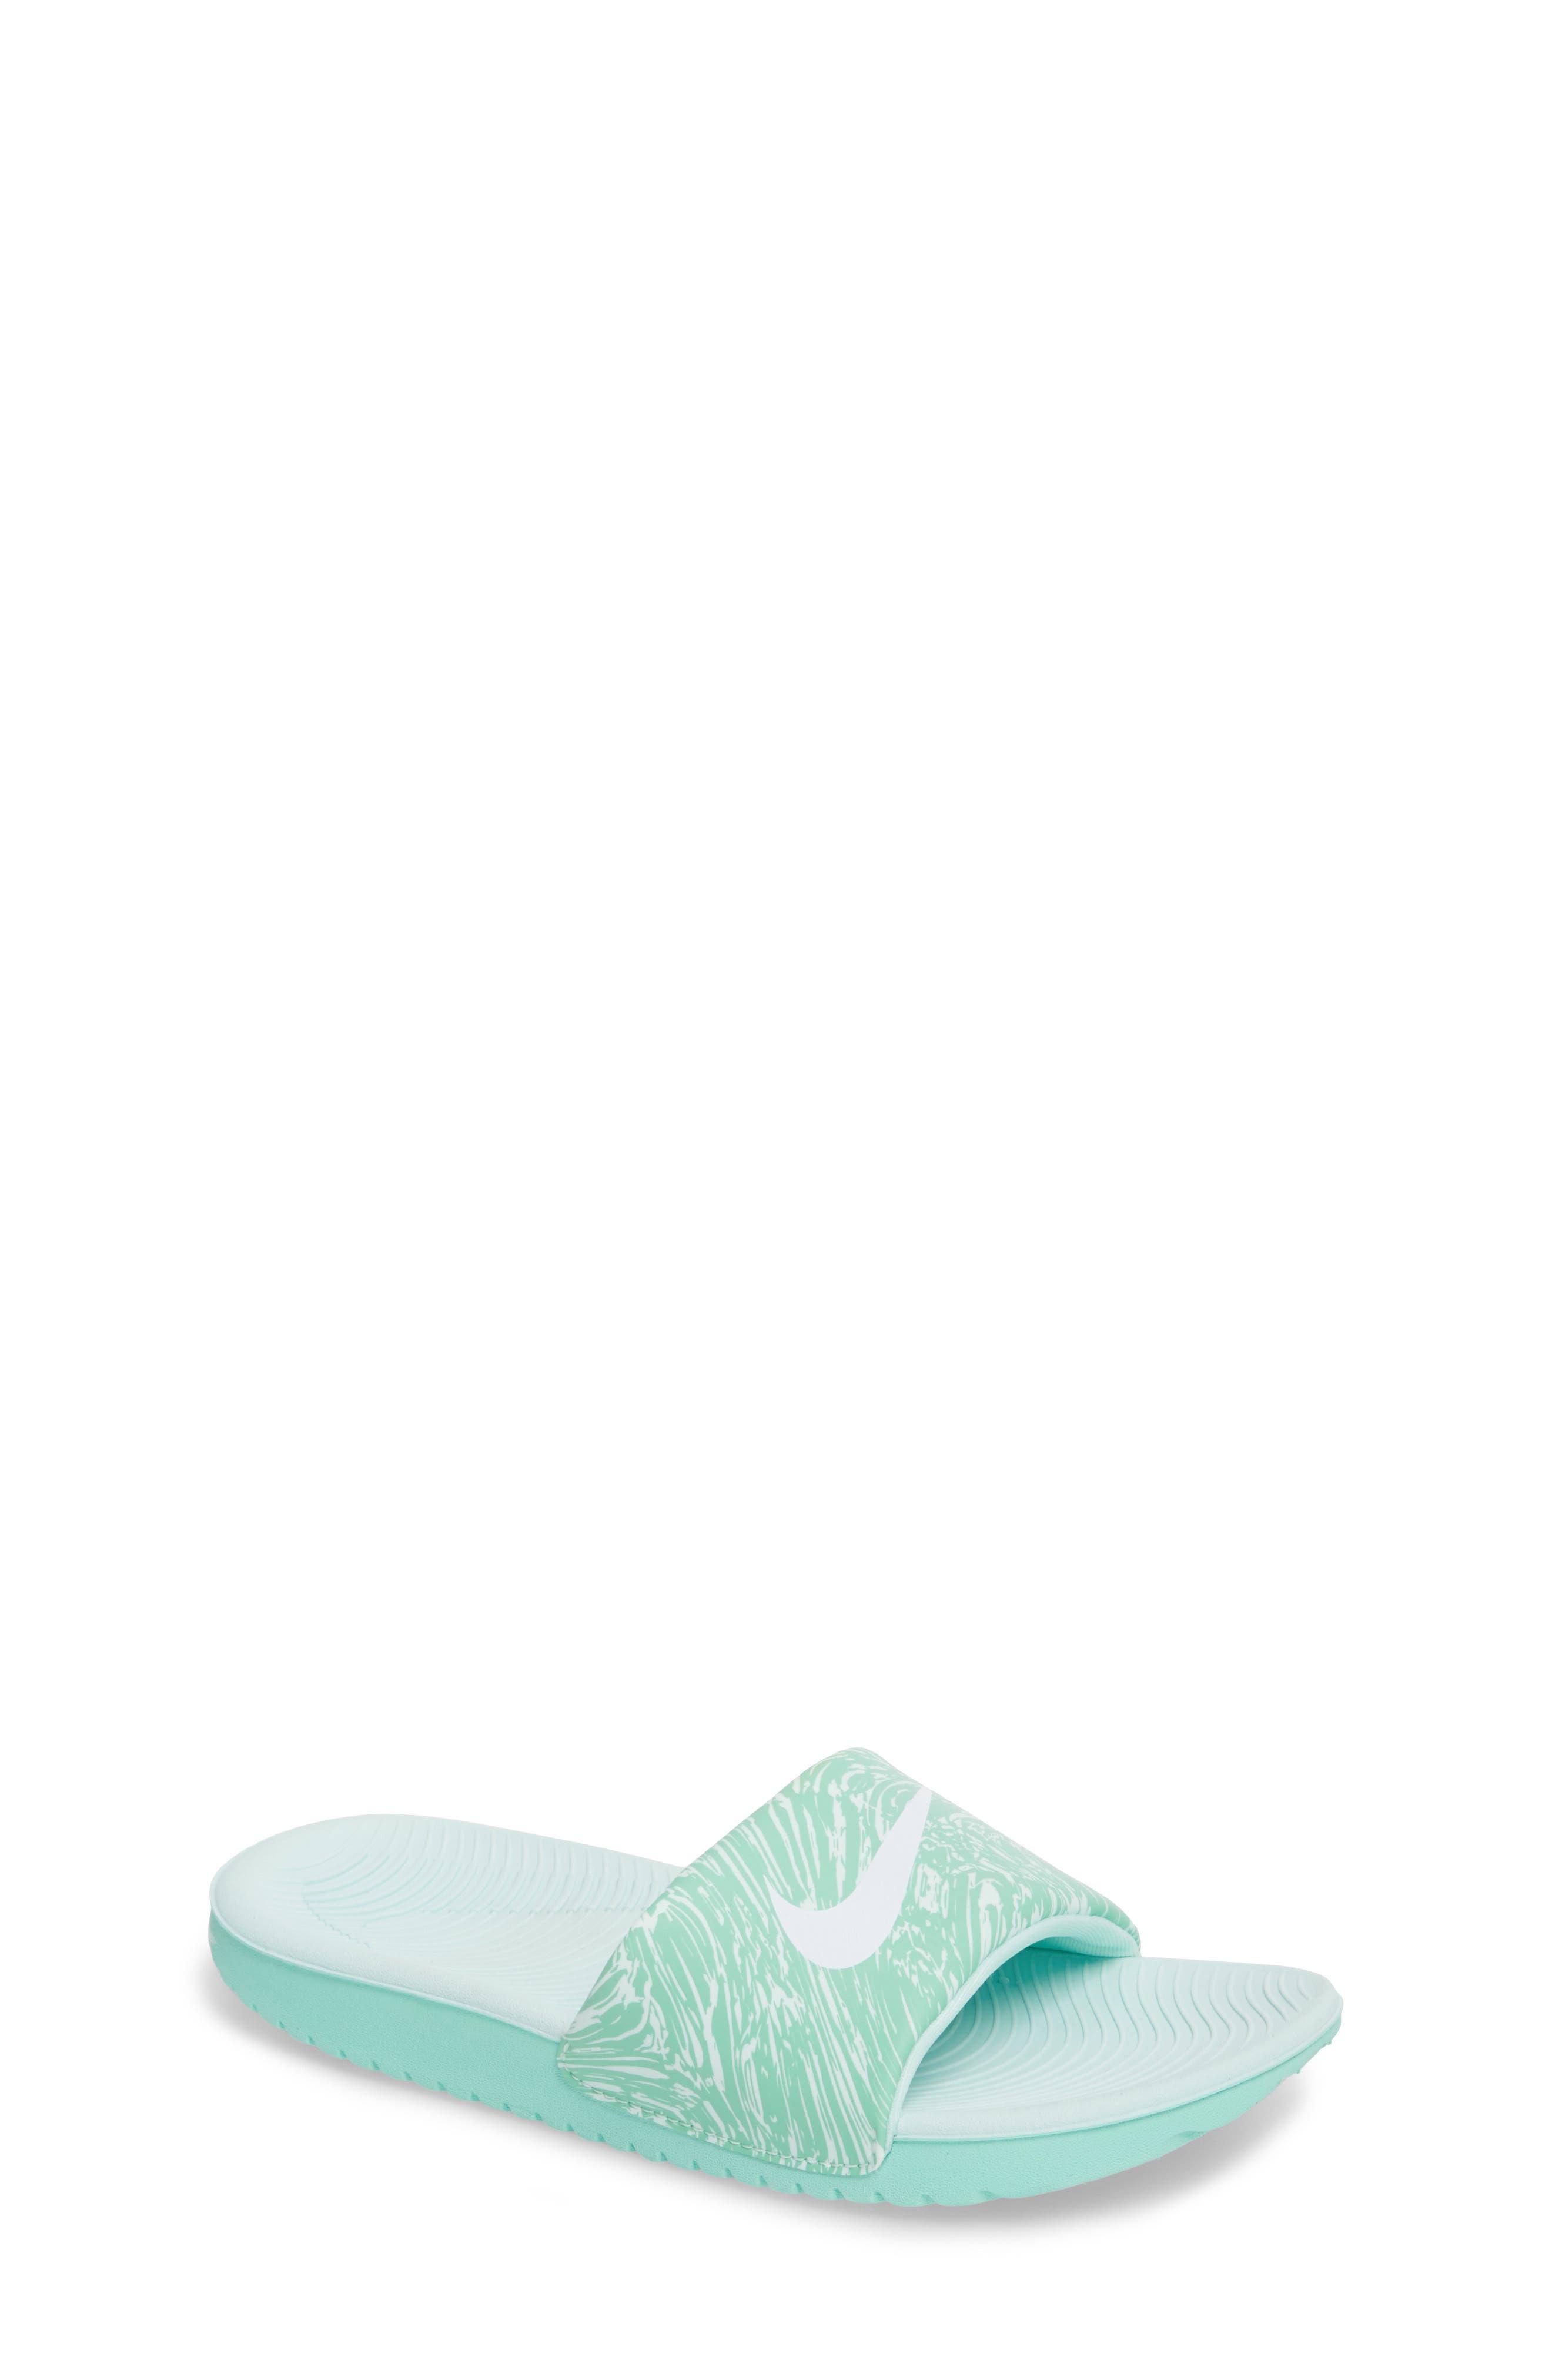 'Kawa' Print Slide Sandal,                             Main thumbnail 1, color,                             Emerald Rise/ White/ Igloo